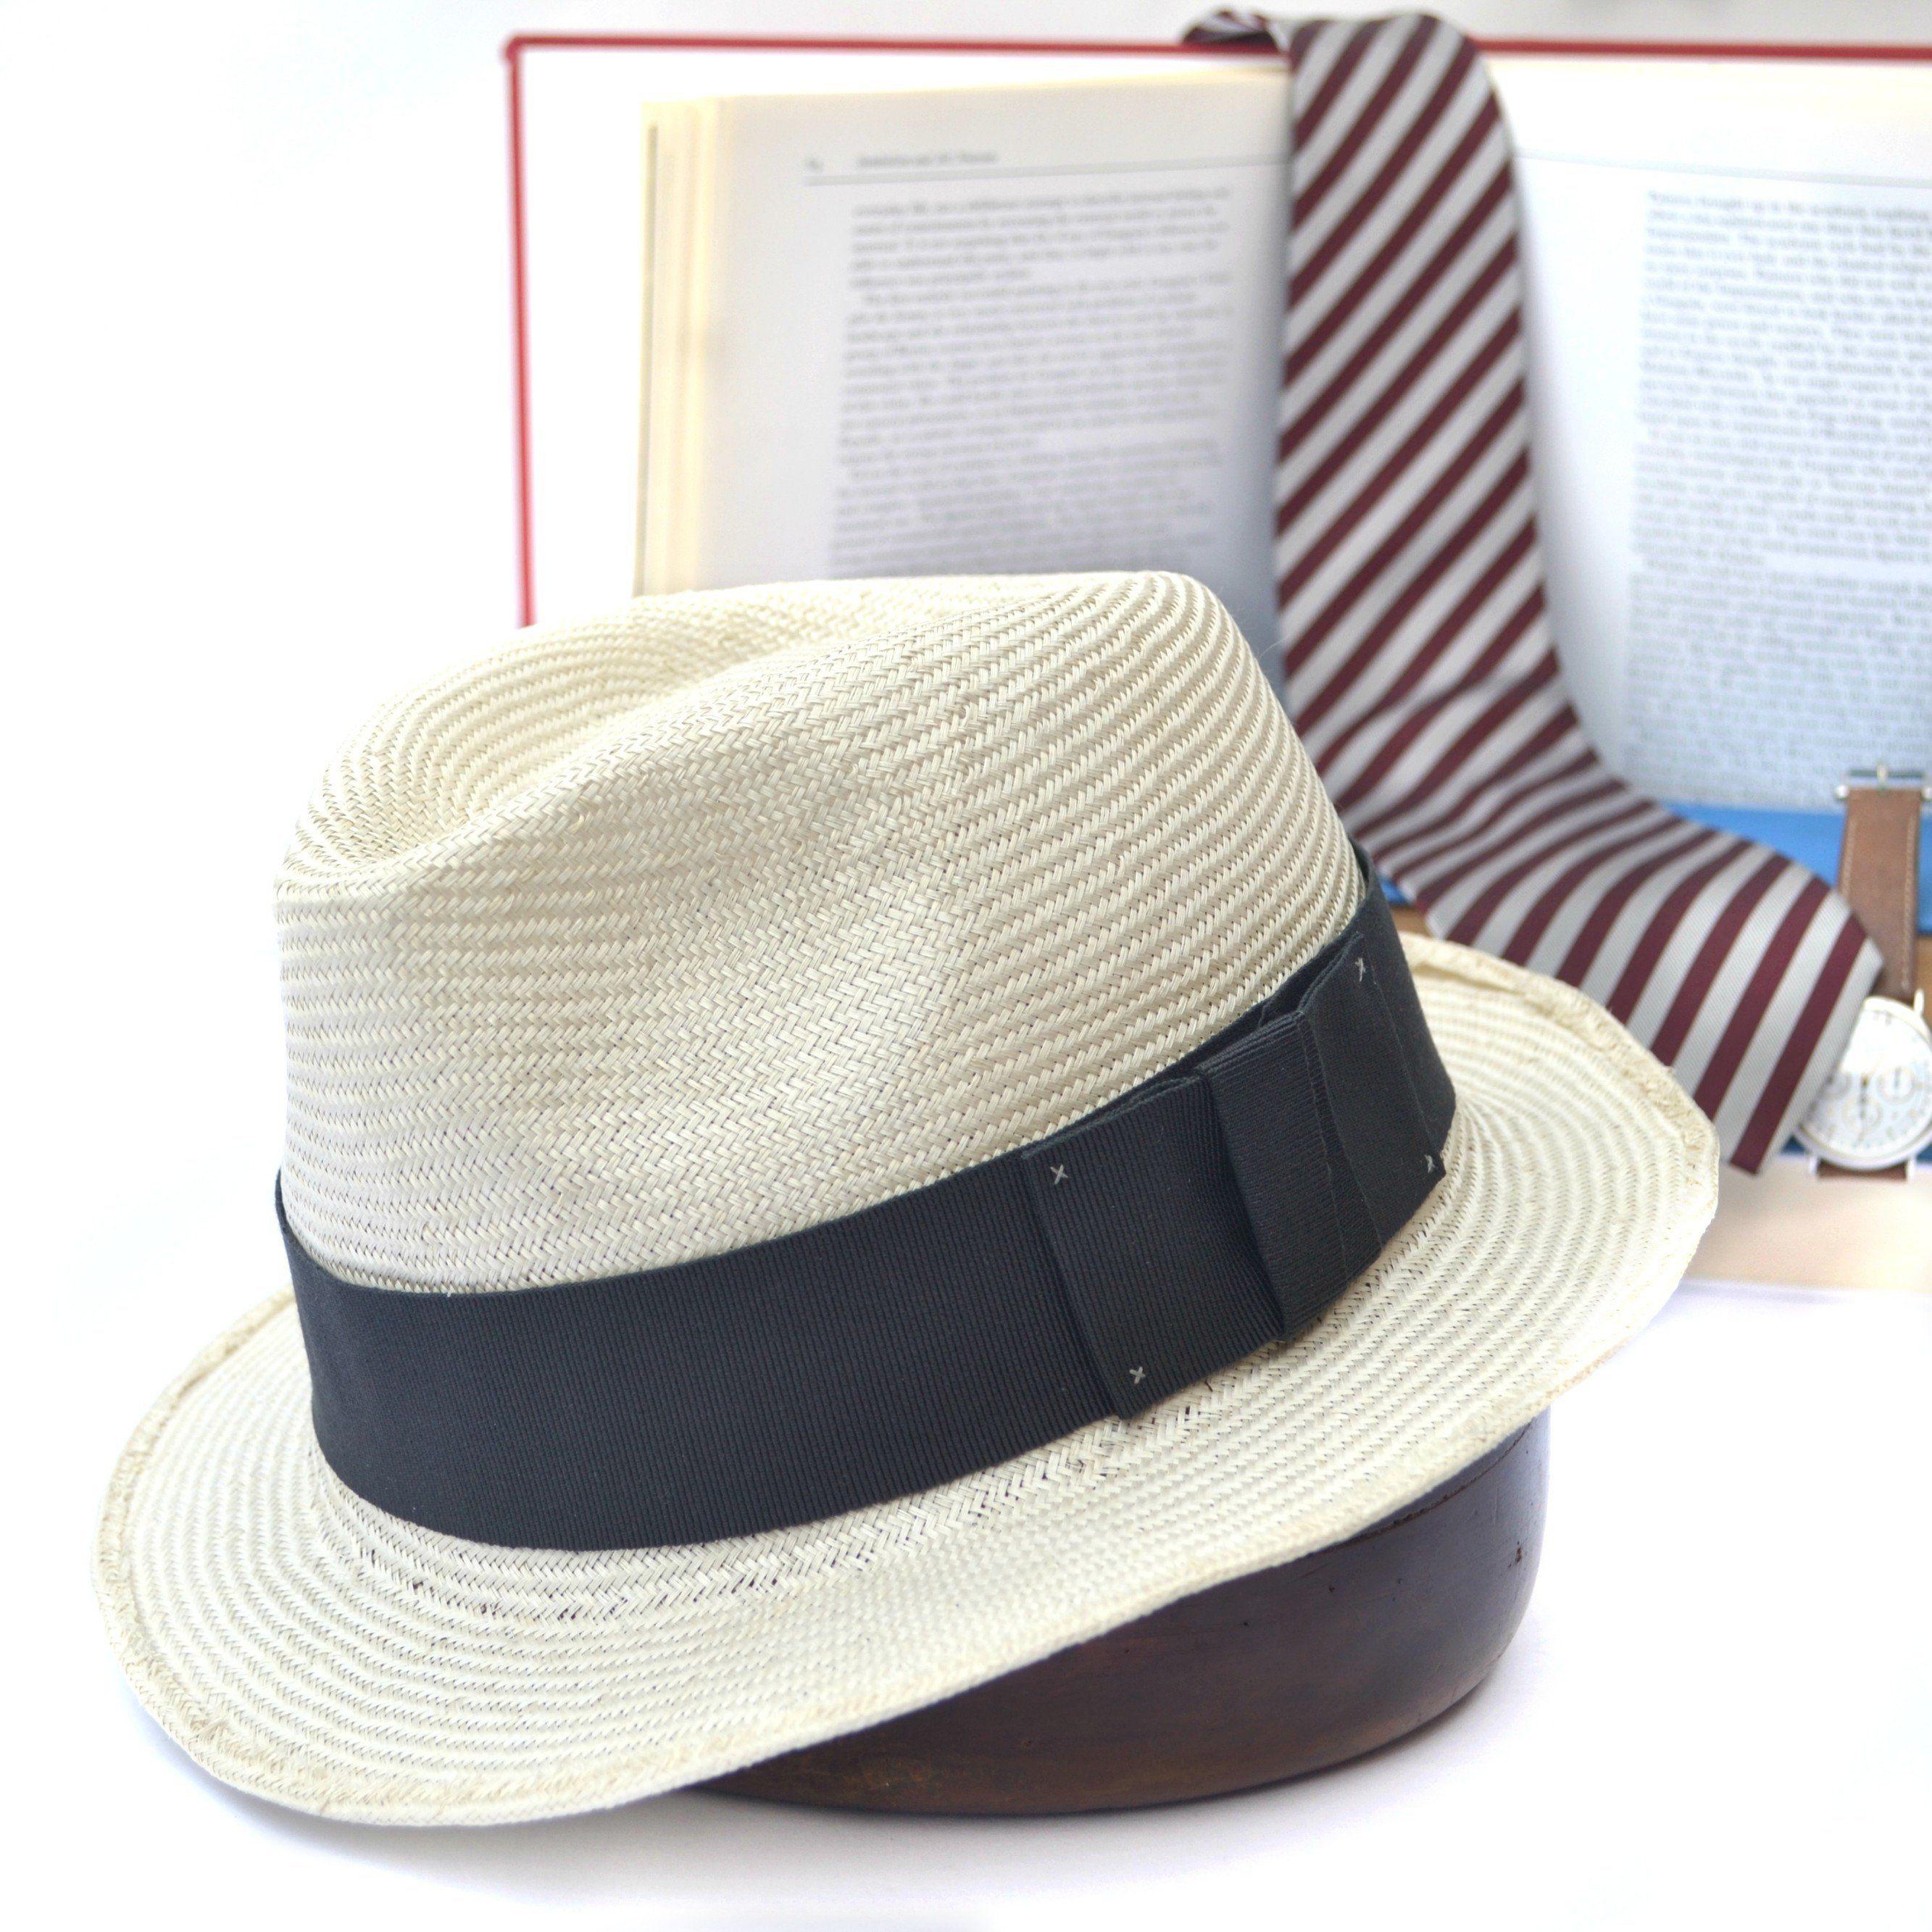 d3b14d748 Men straw sun hat, fedora small brim, white cream in 2019 ...